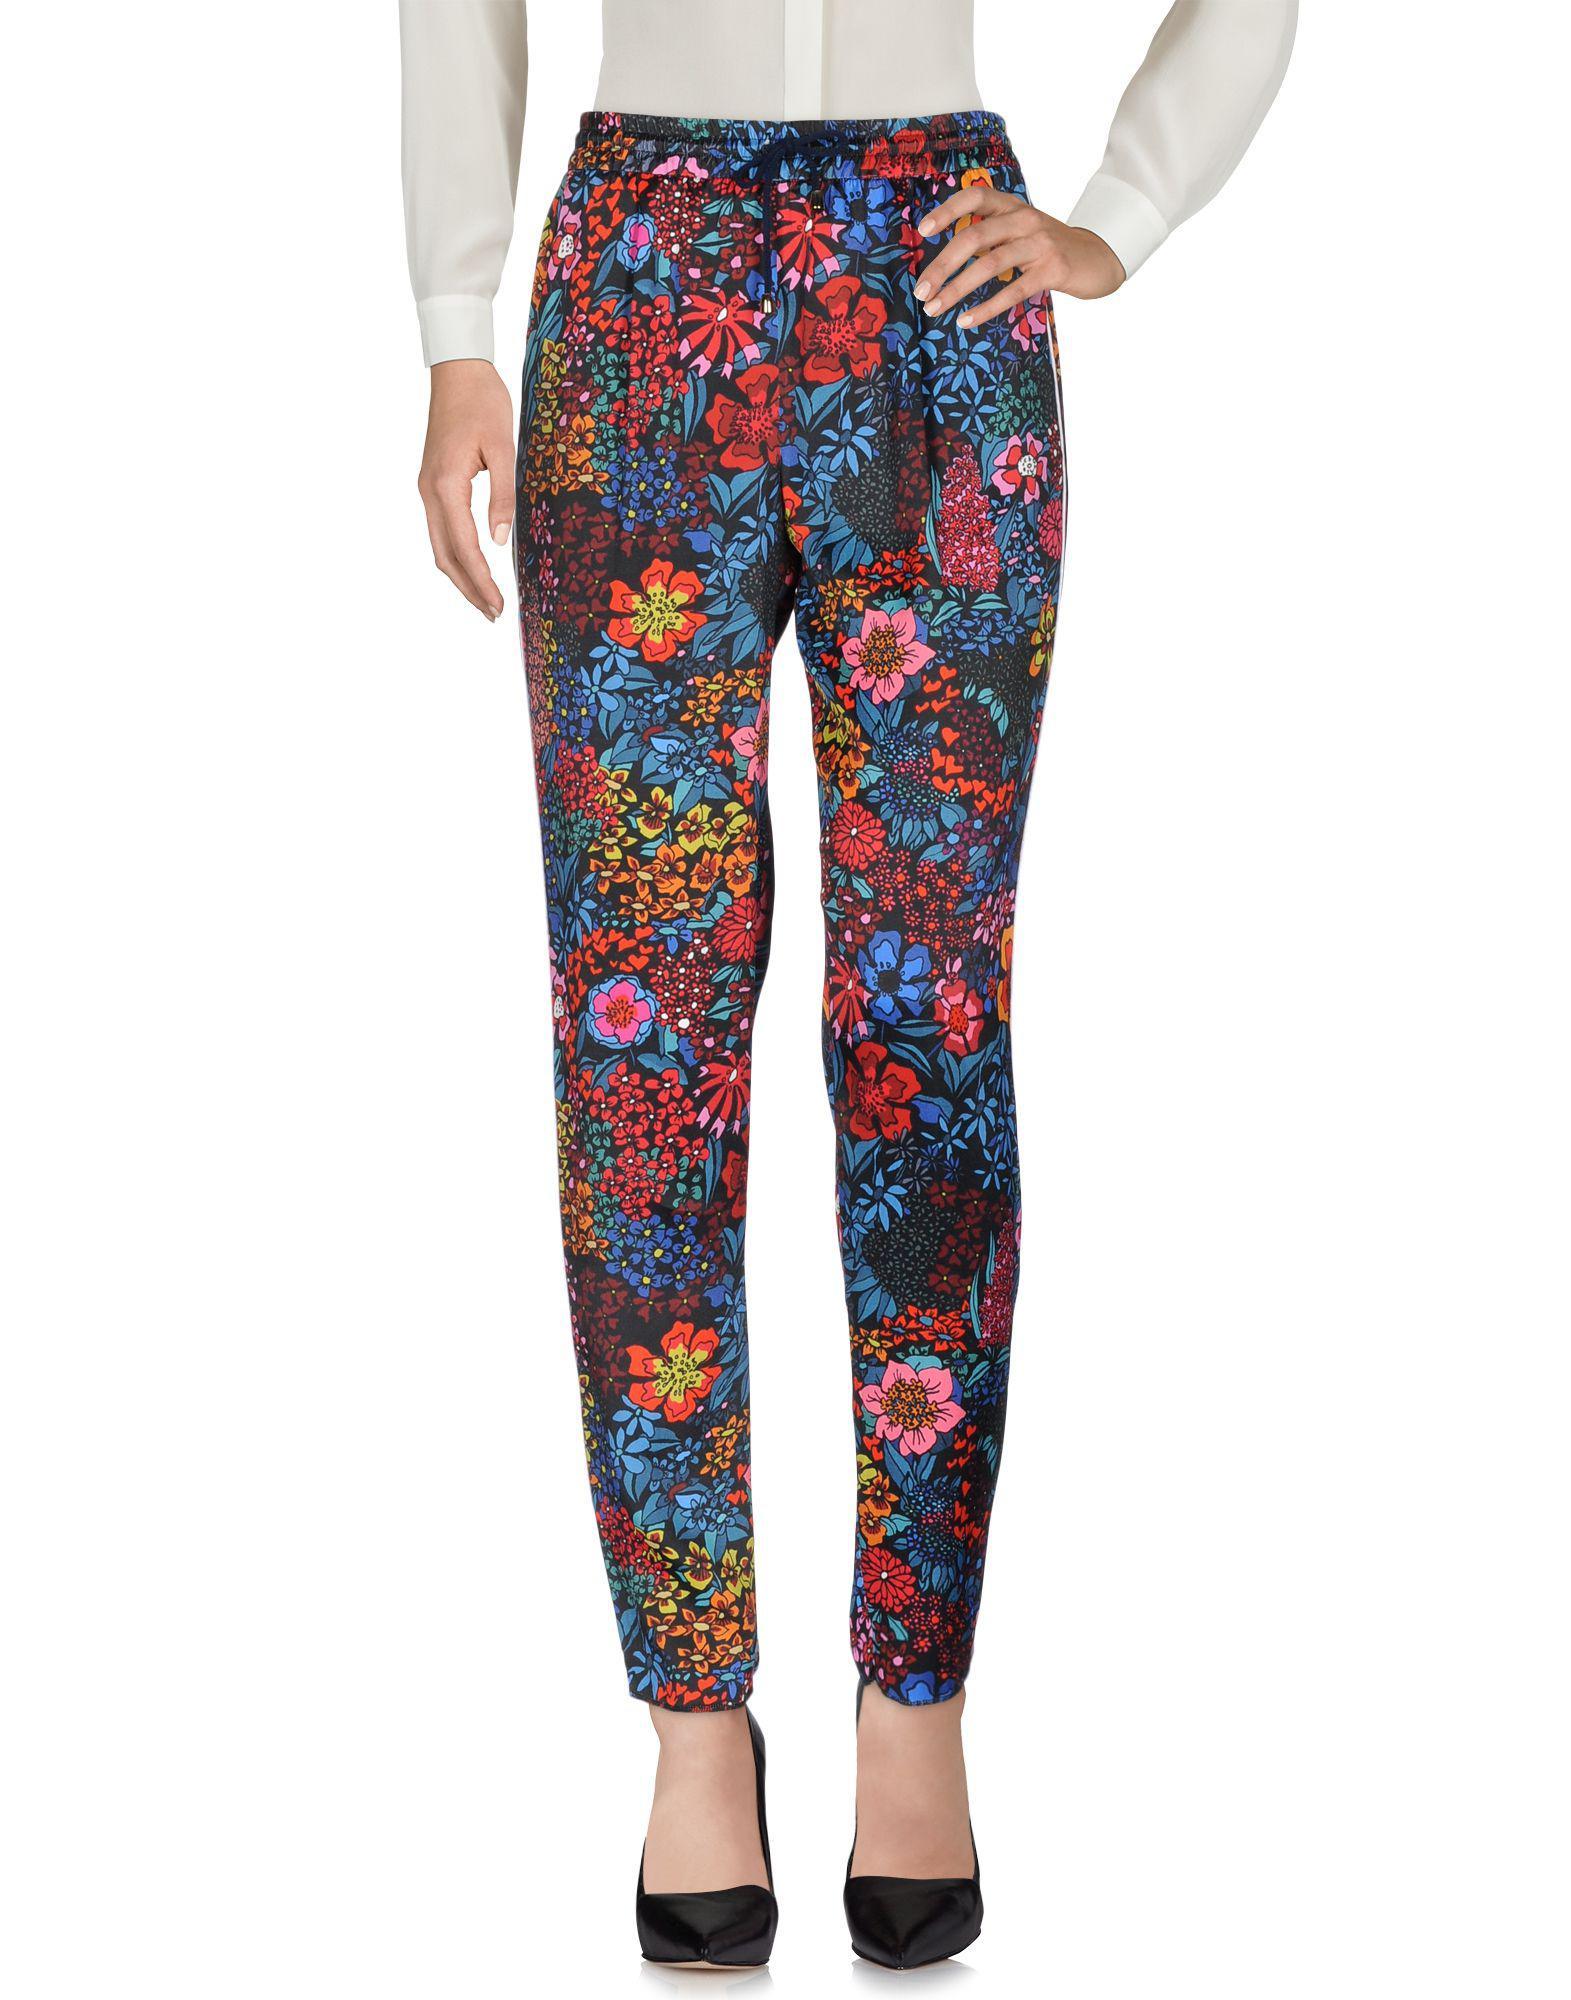 Sale Manchester Great Sale DENIM - Denim trousers Leitmotiv Outlet Find Great For Nice Buy Cheap 100% Authentic b8EV1U1SkR